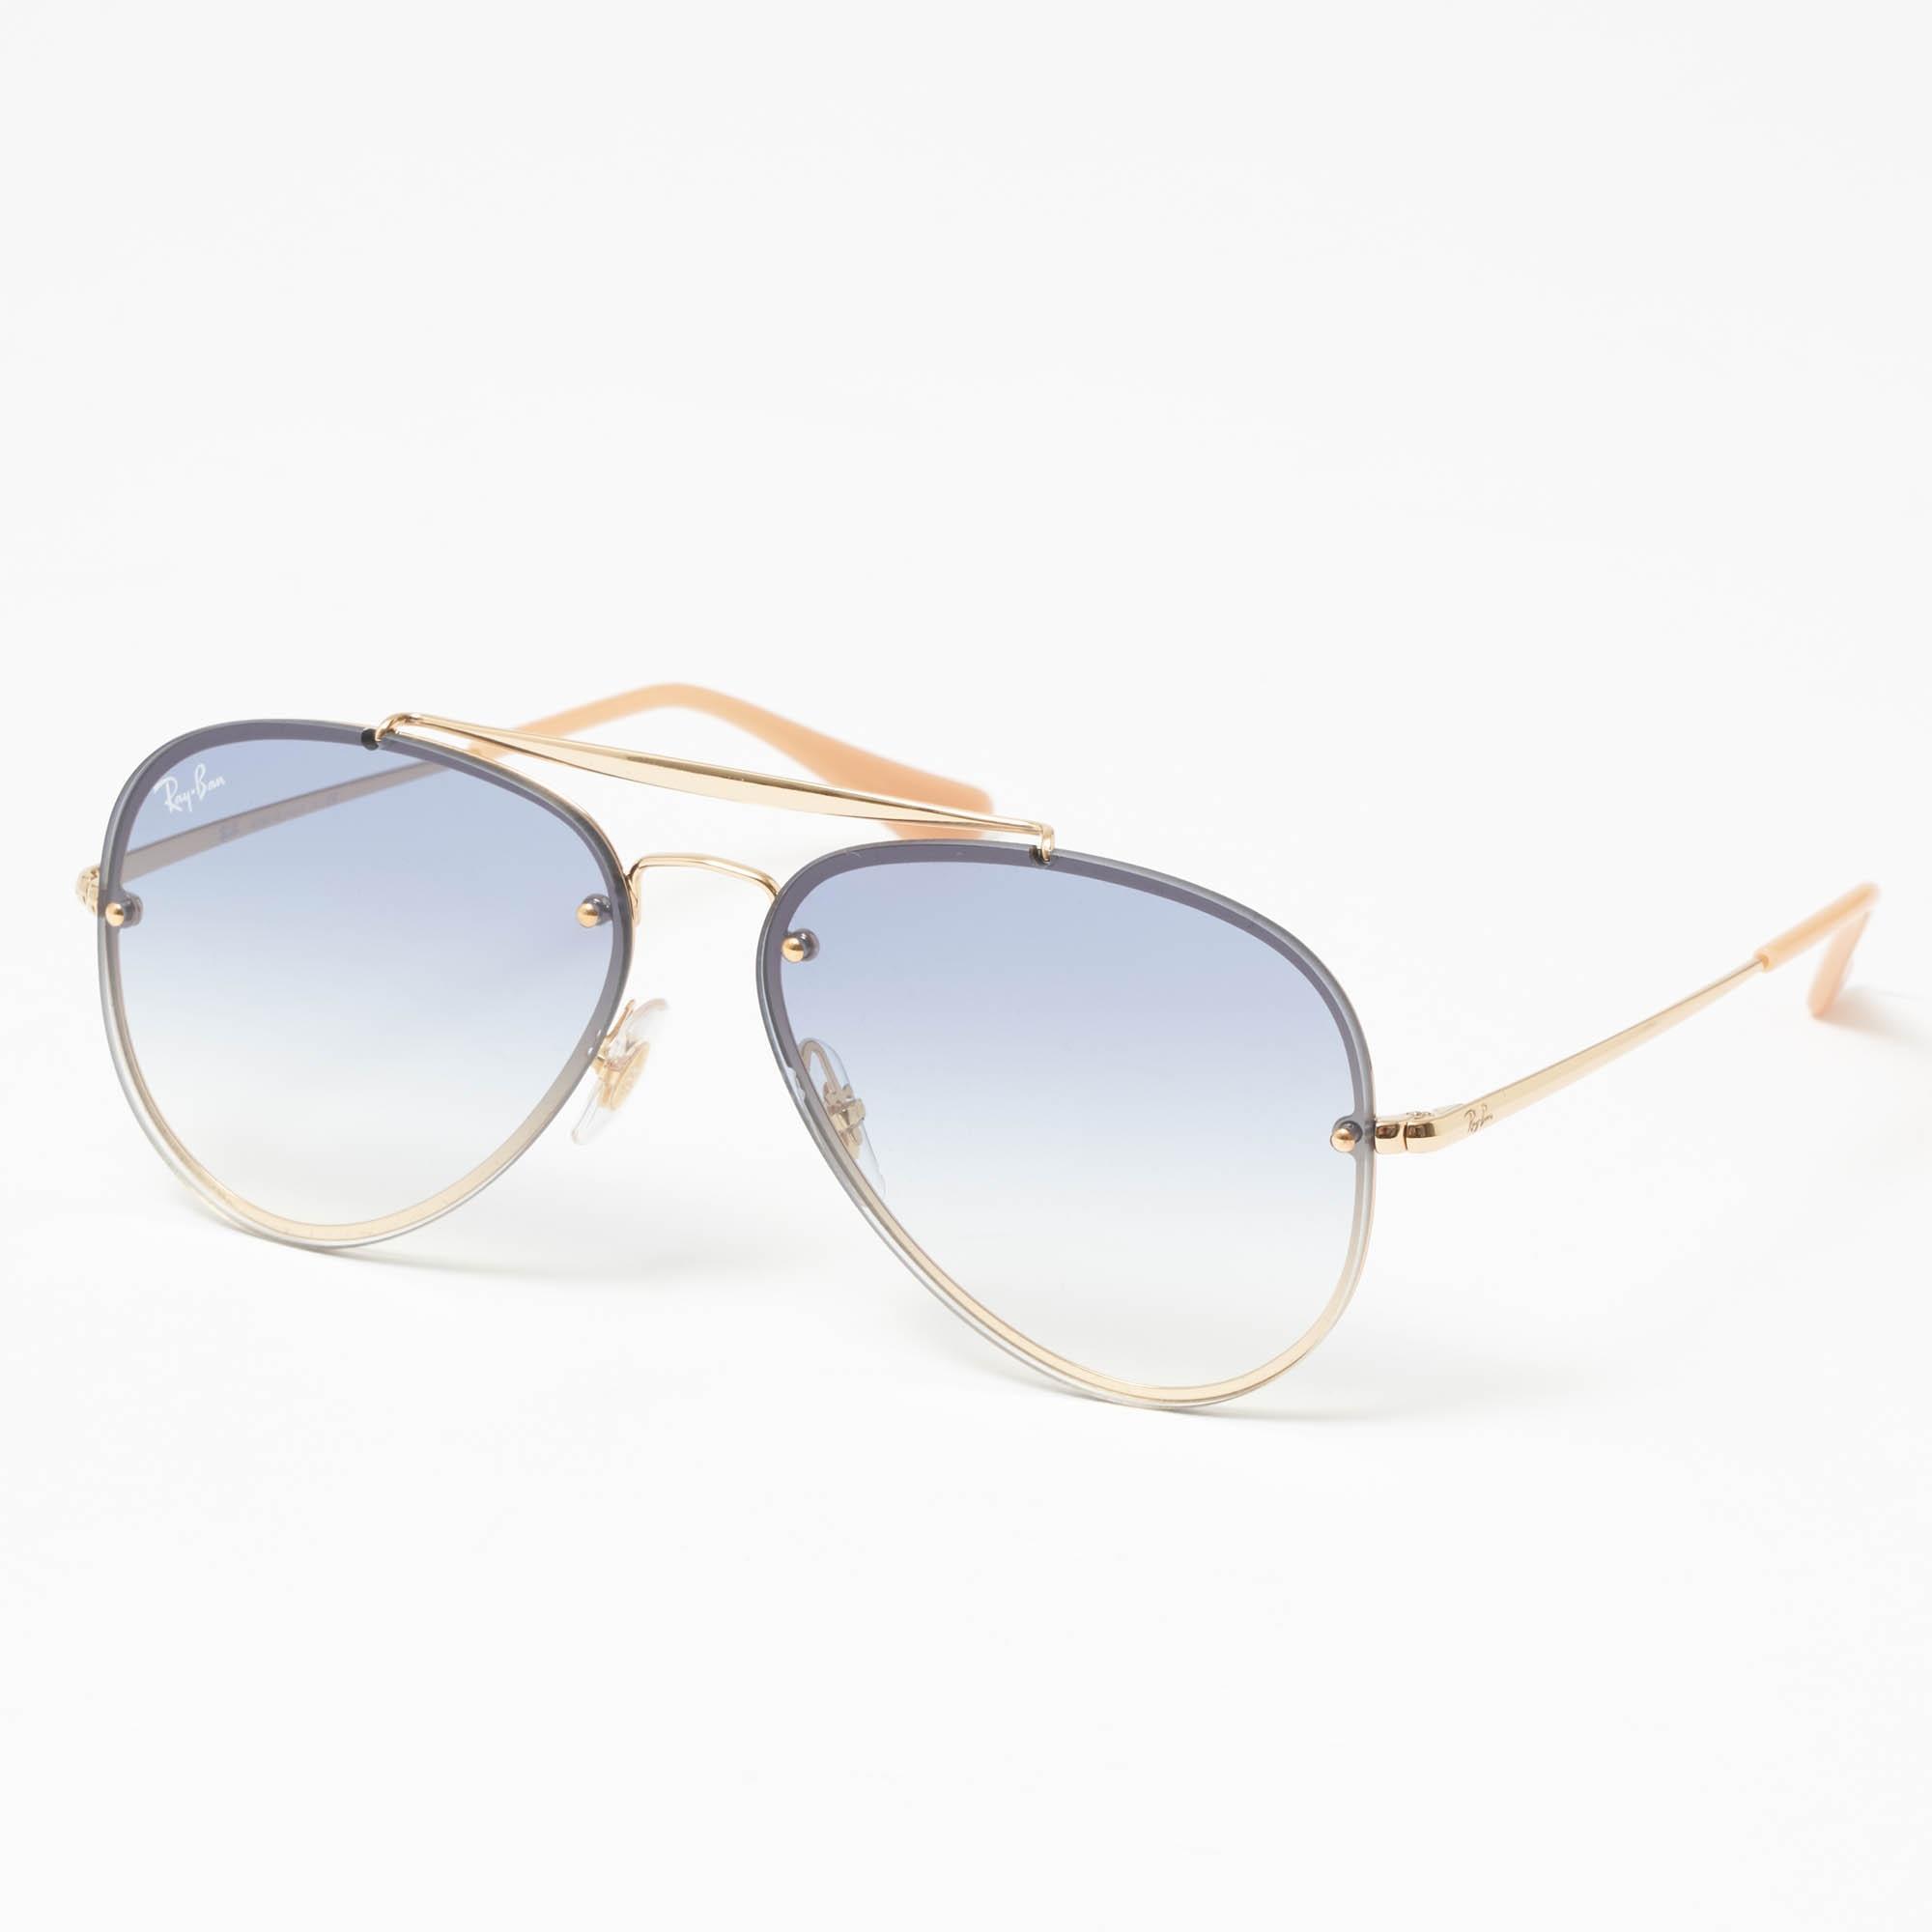 e406e6e2ba9 Ray-Ban. Men s Metallic Gold Blaze Aviator Sunglasses - Light Blue Gradient  Lenses